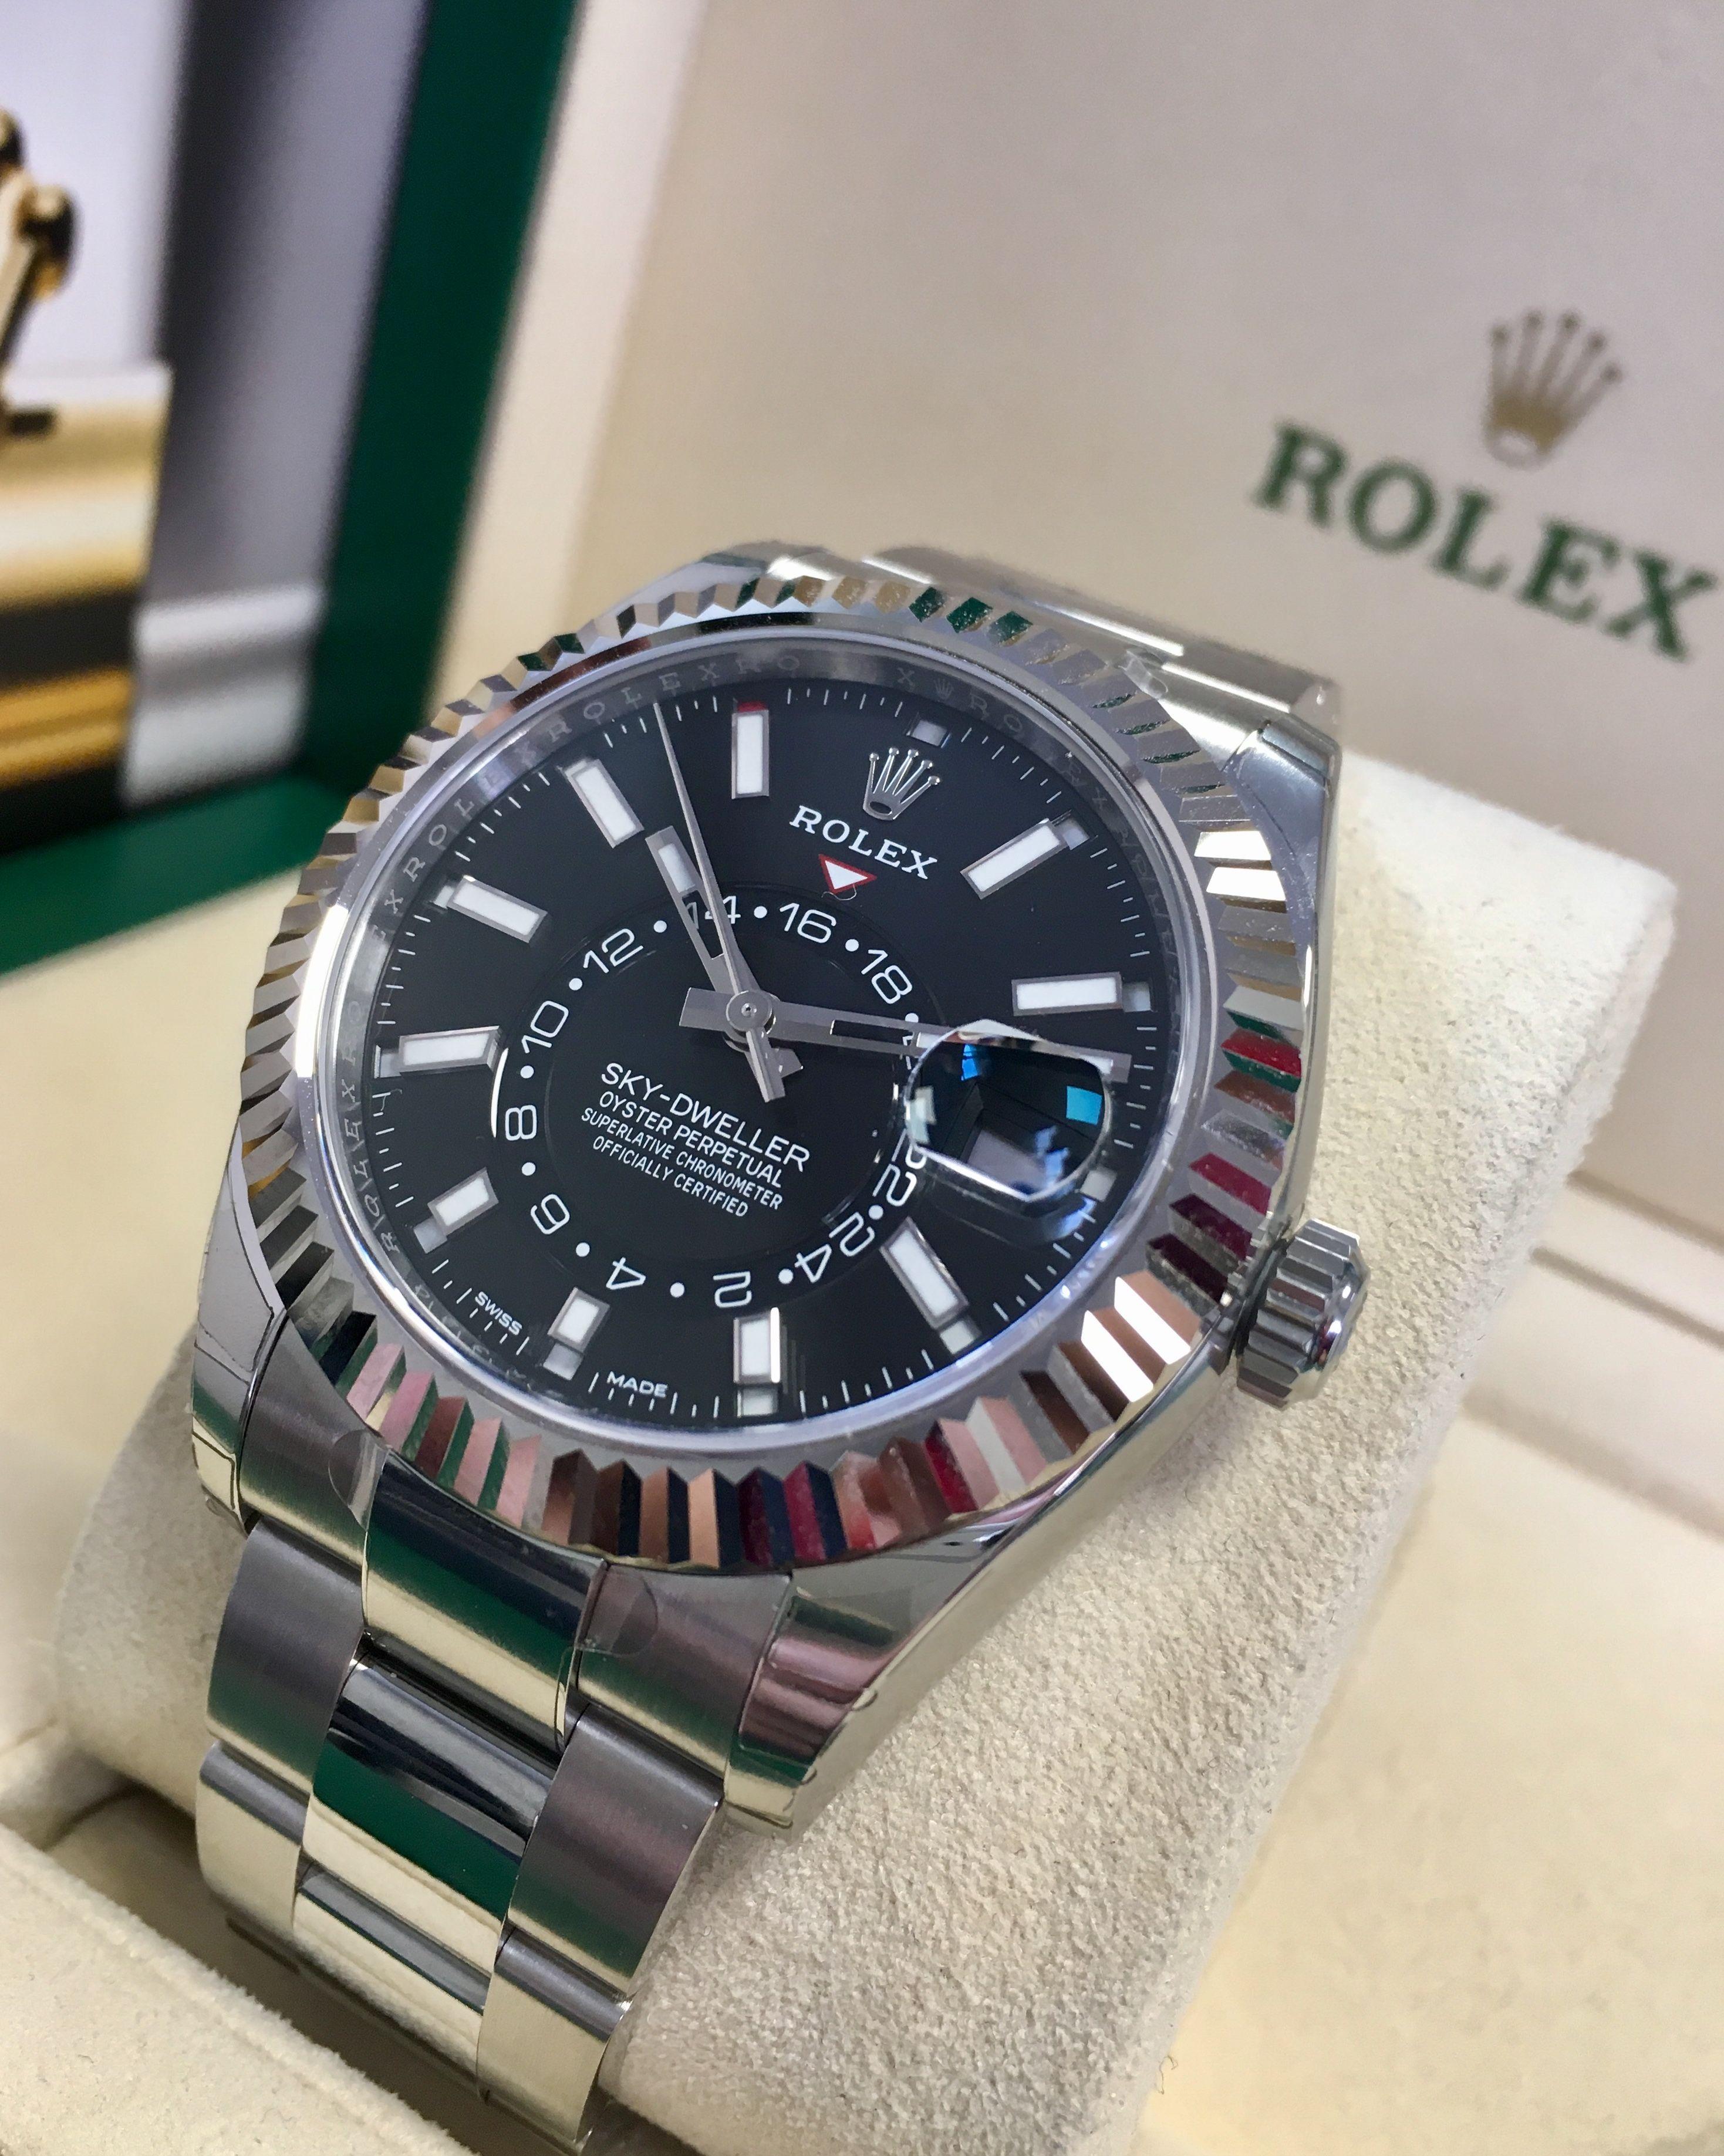 Rolex Sky,Dweller Stainless Steel Black Dial 326934